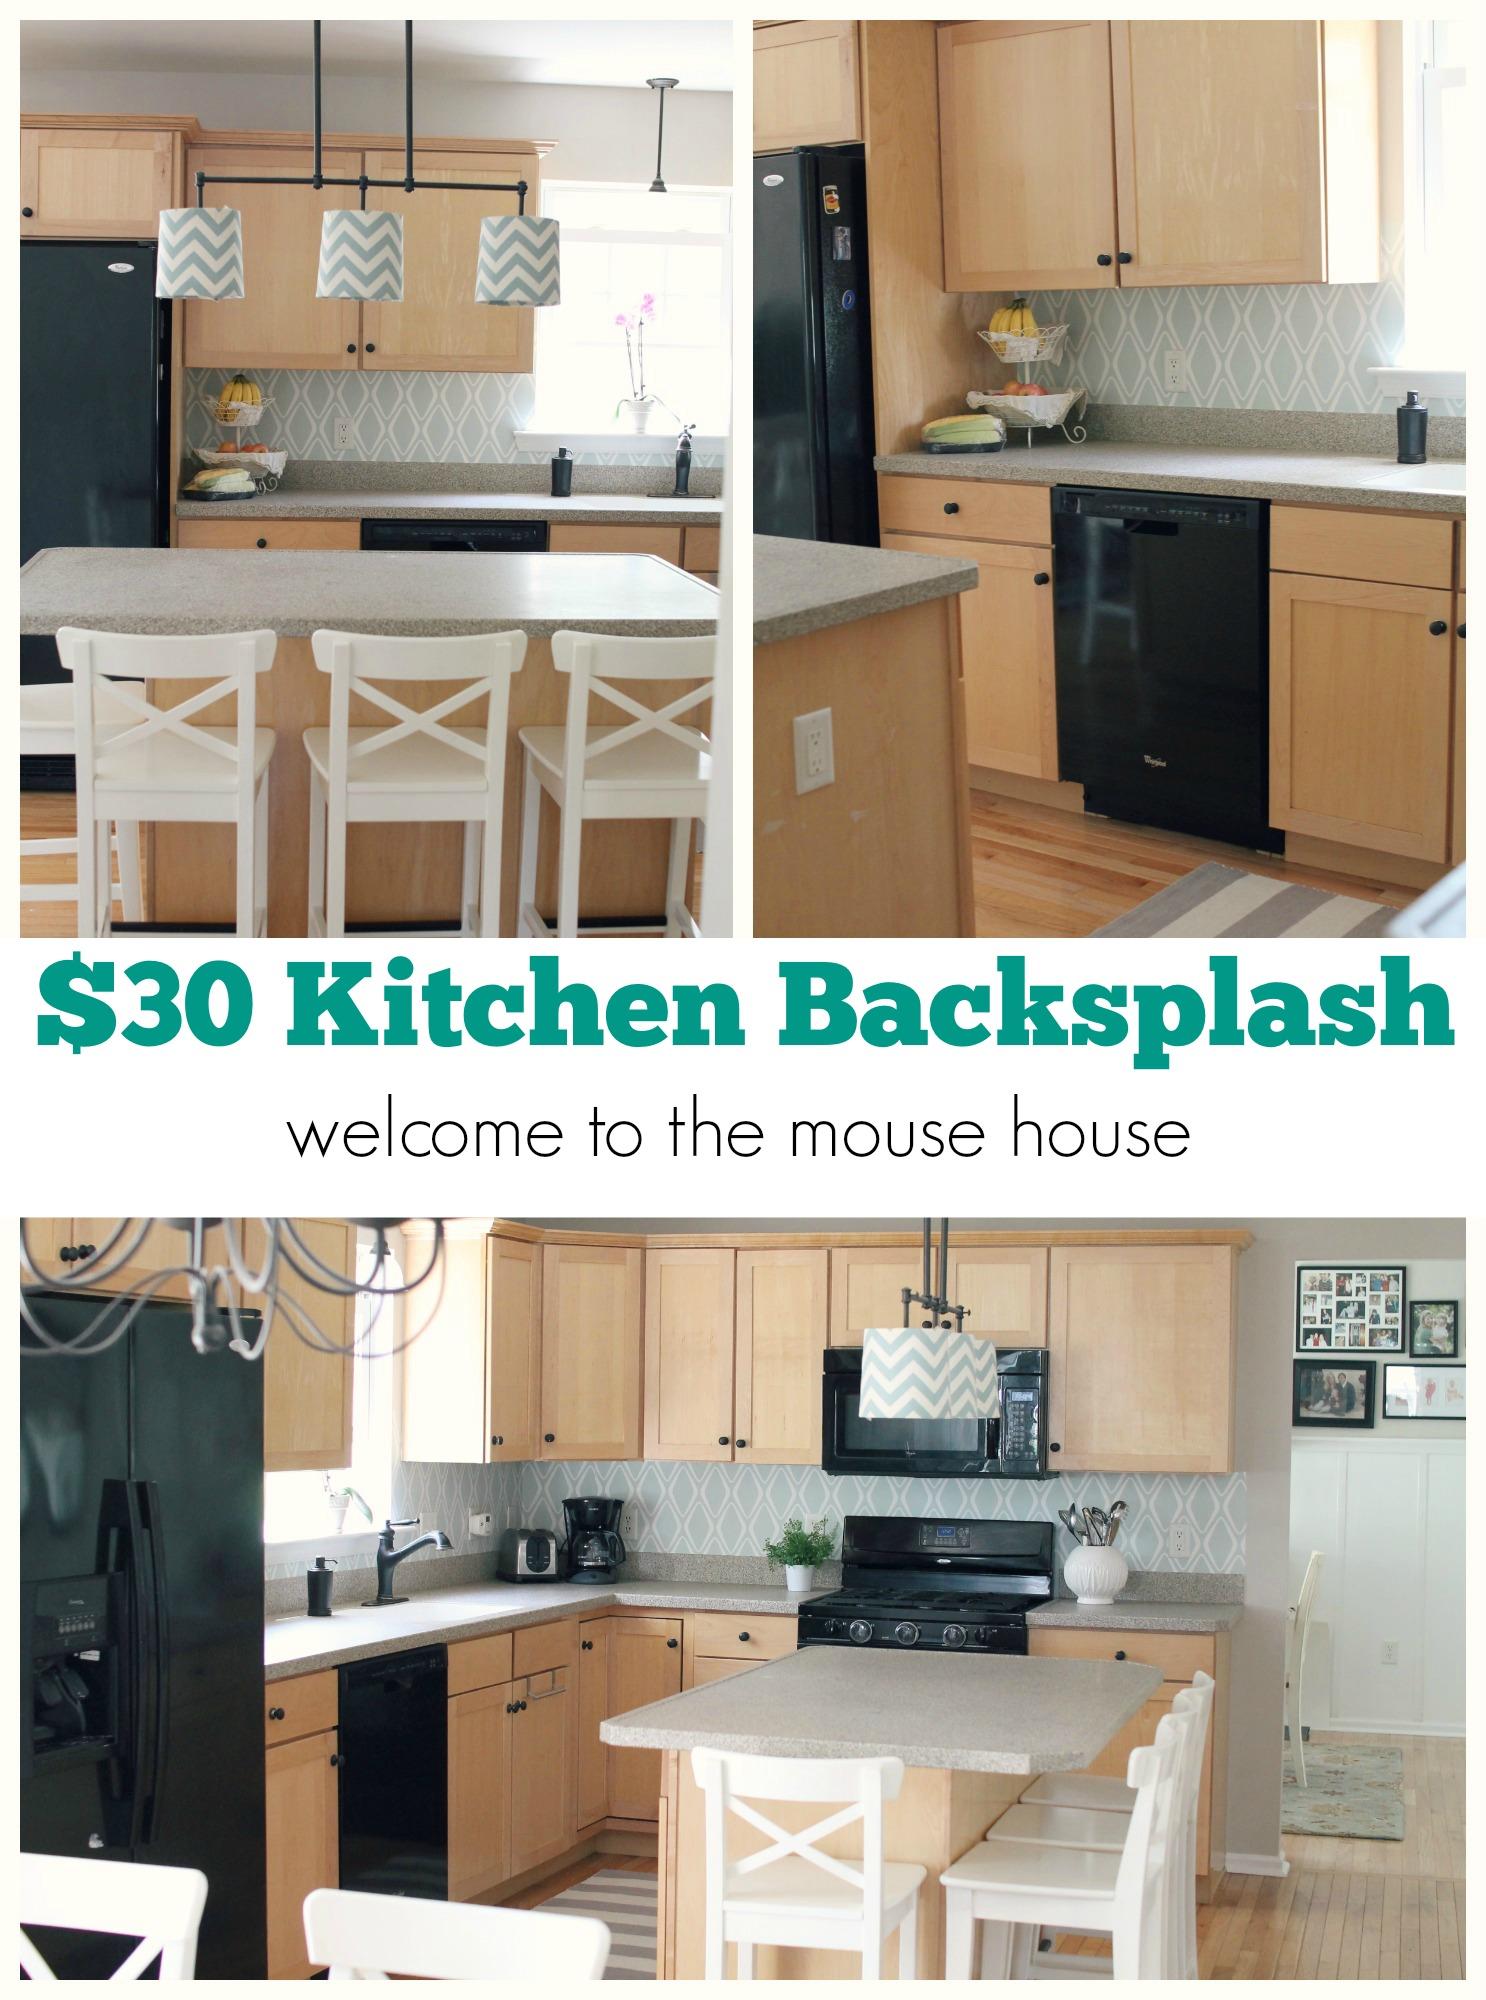 Easy Kitchen Backsplash 30 Target Wallpaper 1486x2000